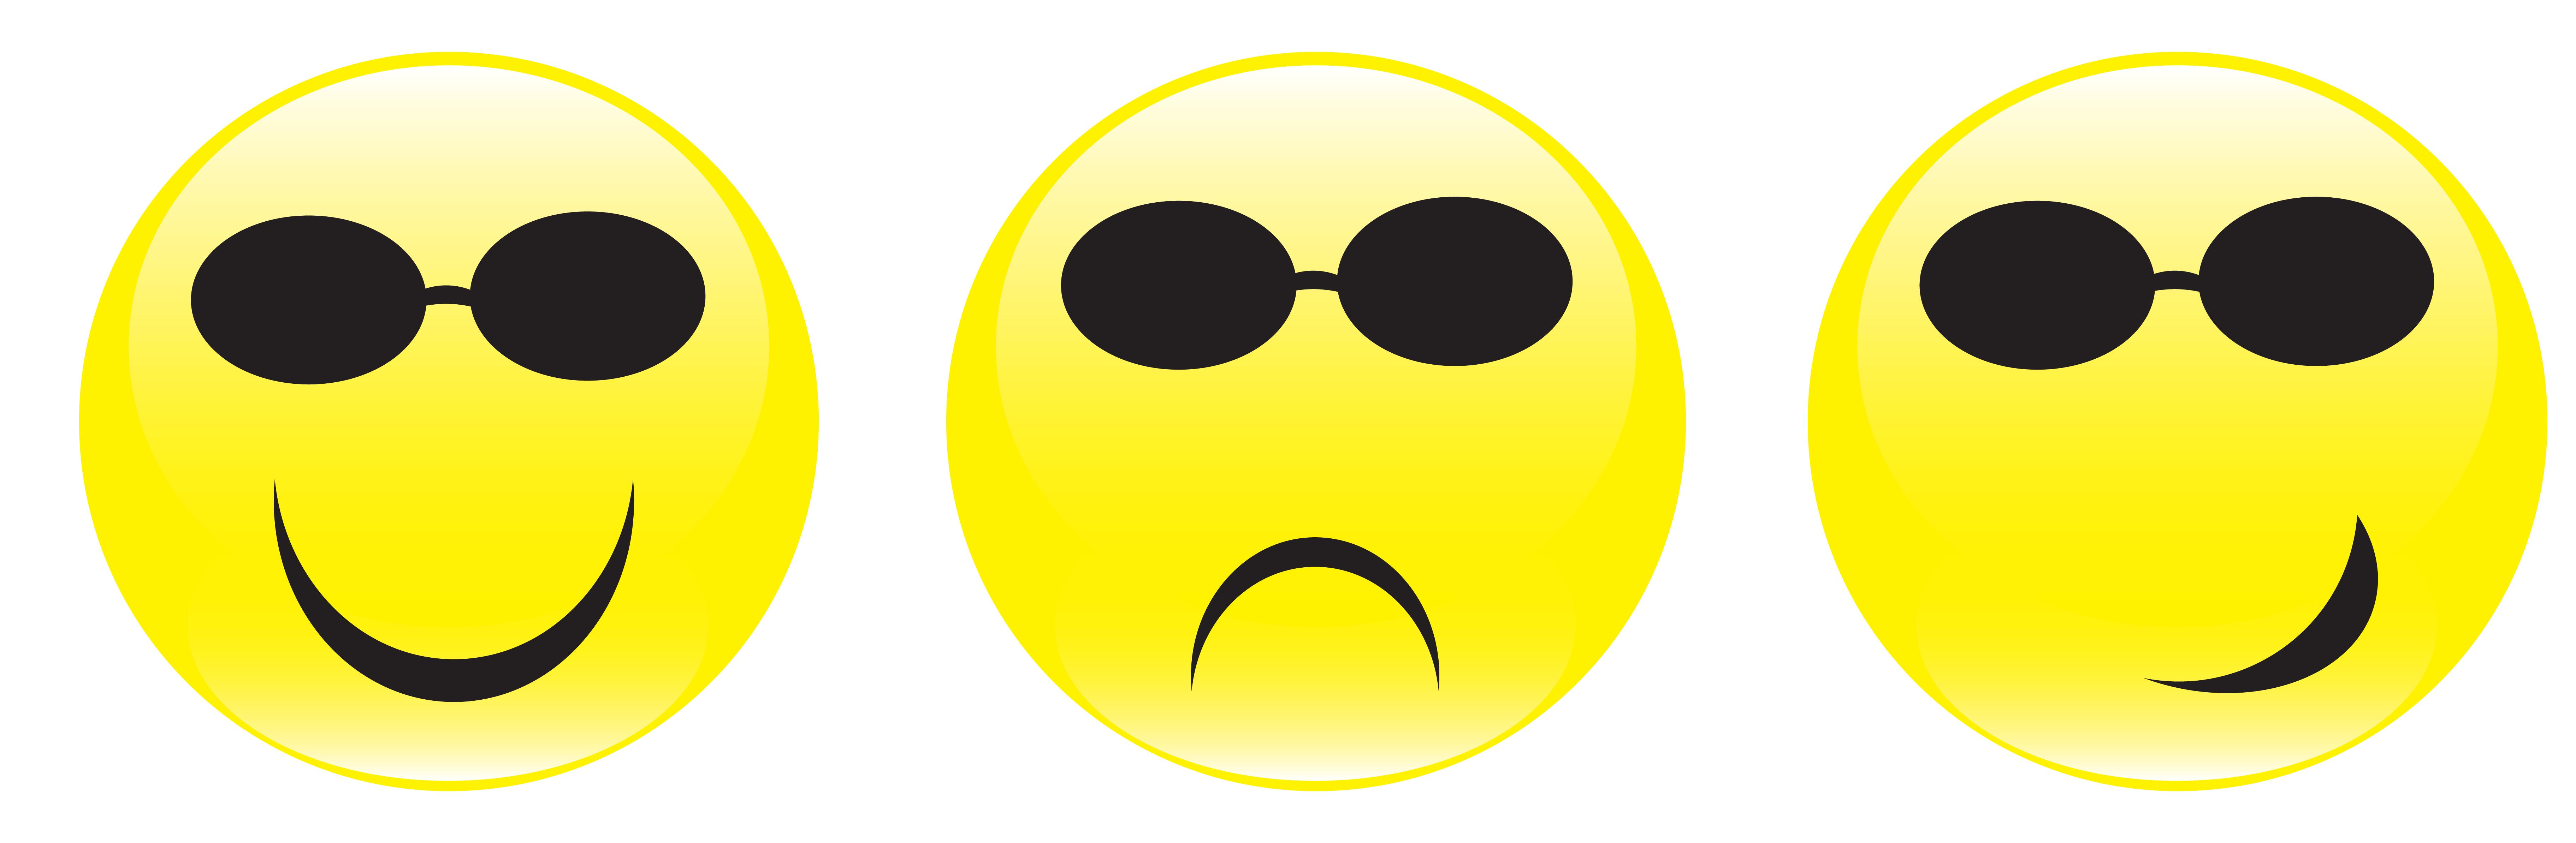 7293x2388 Smiley Face Sad Face Straight Face